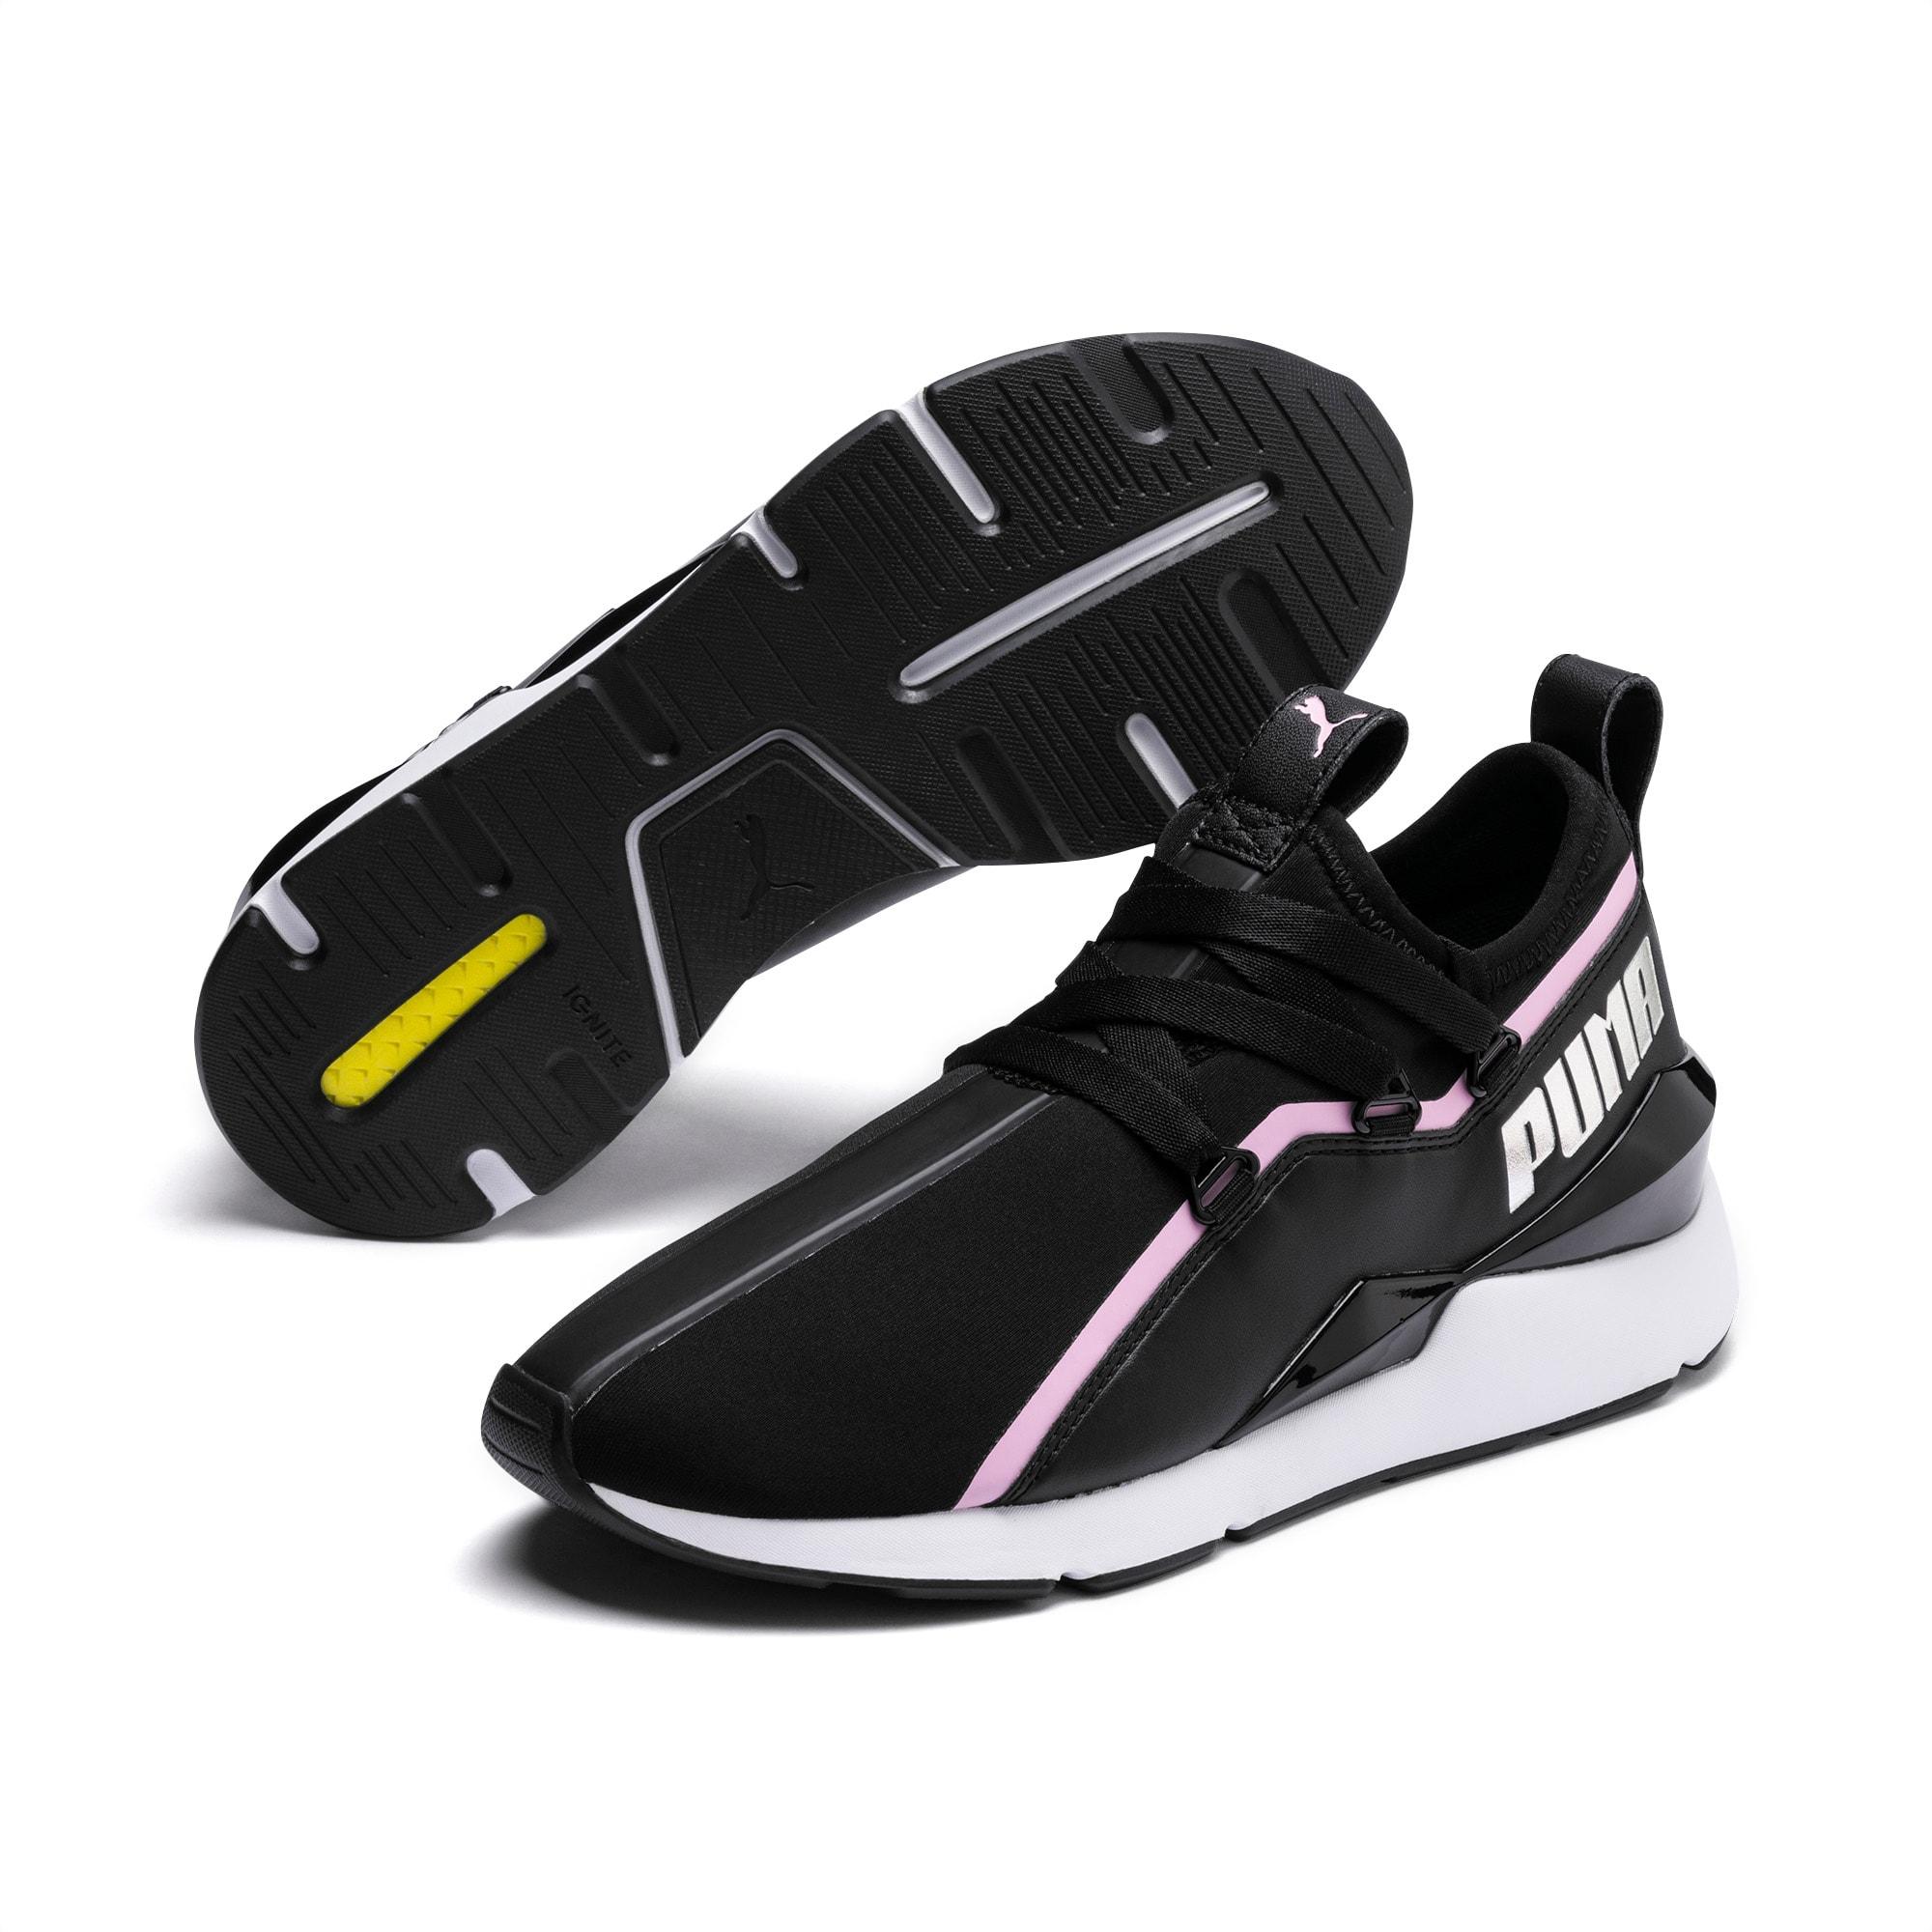 Puma Muse 2 Tz Sneakers Puma BlackLilac Sachet